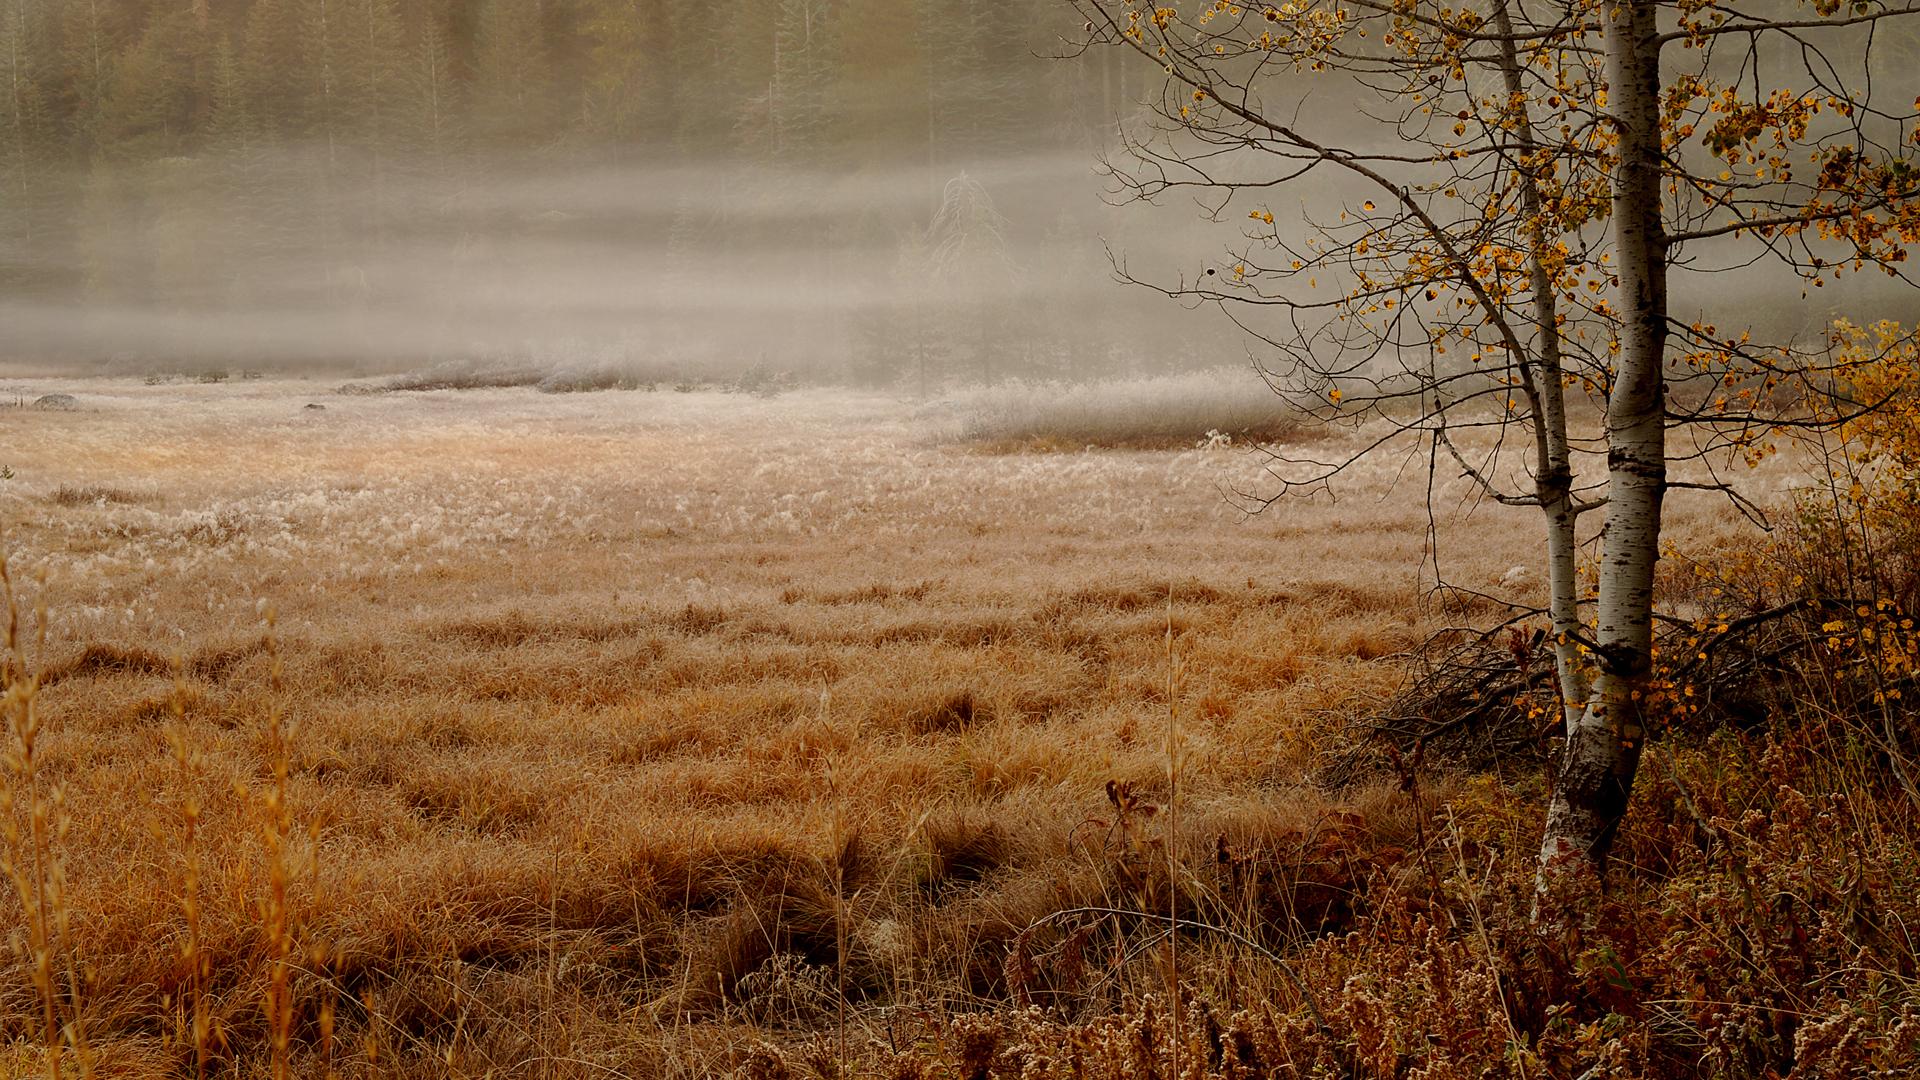 туман поле лес на телефон